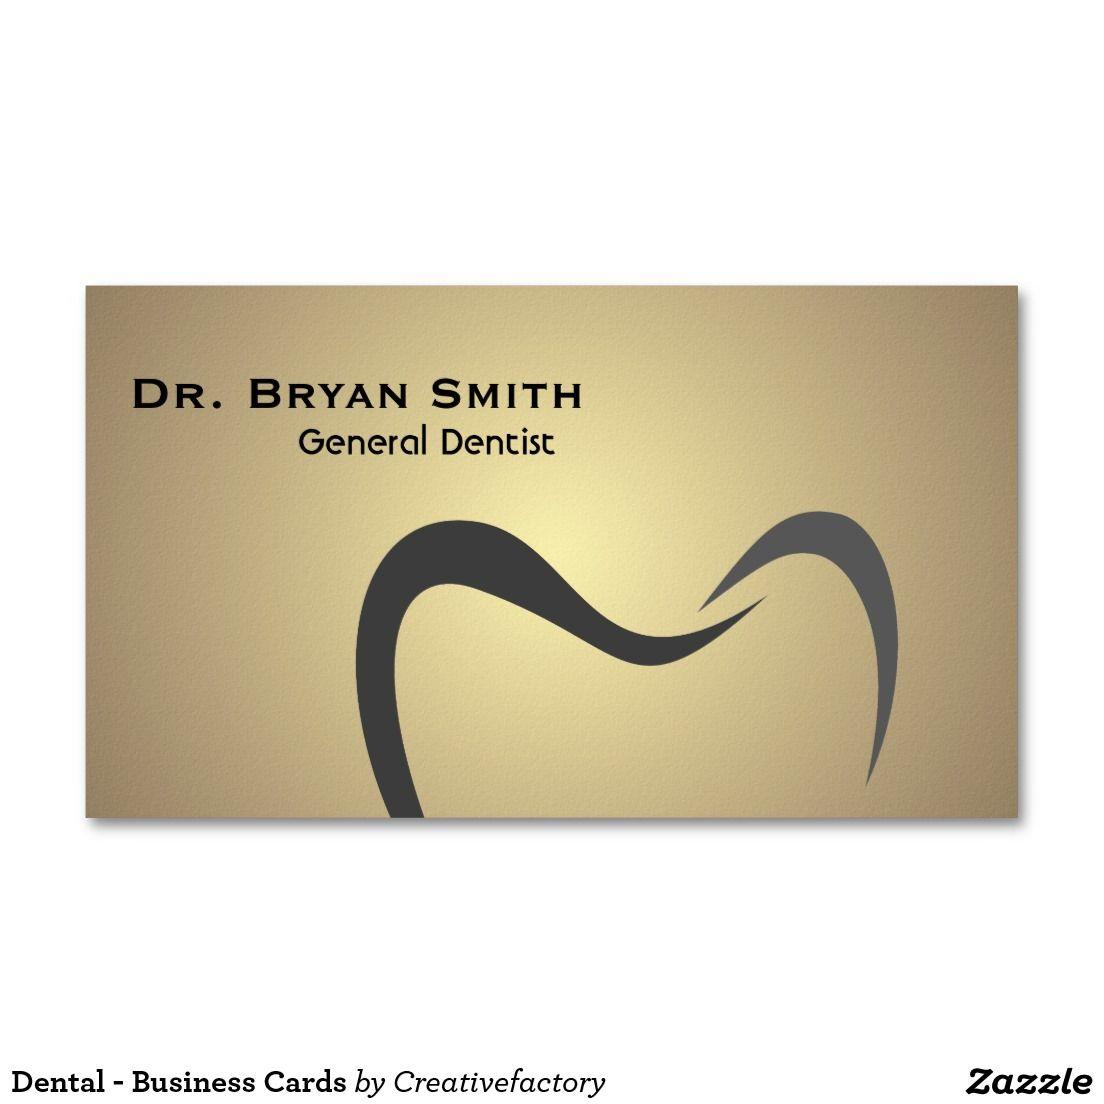 Dental - Business Cards   Dr.Tarang Mahajan   Pinterest   Dental ...